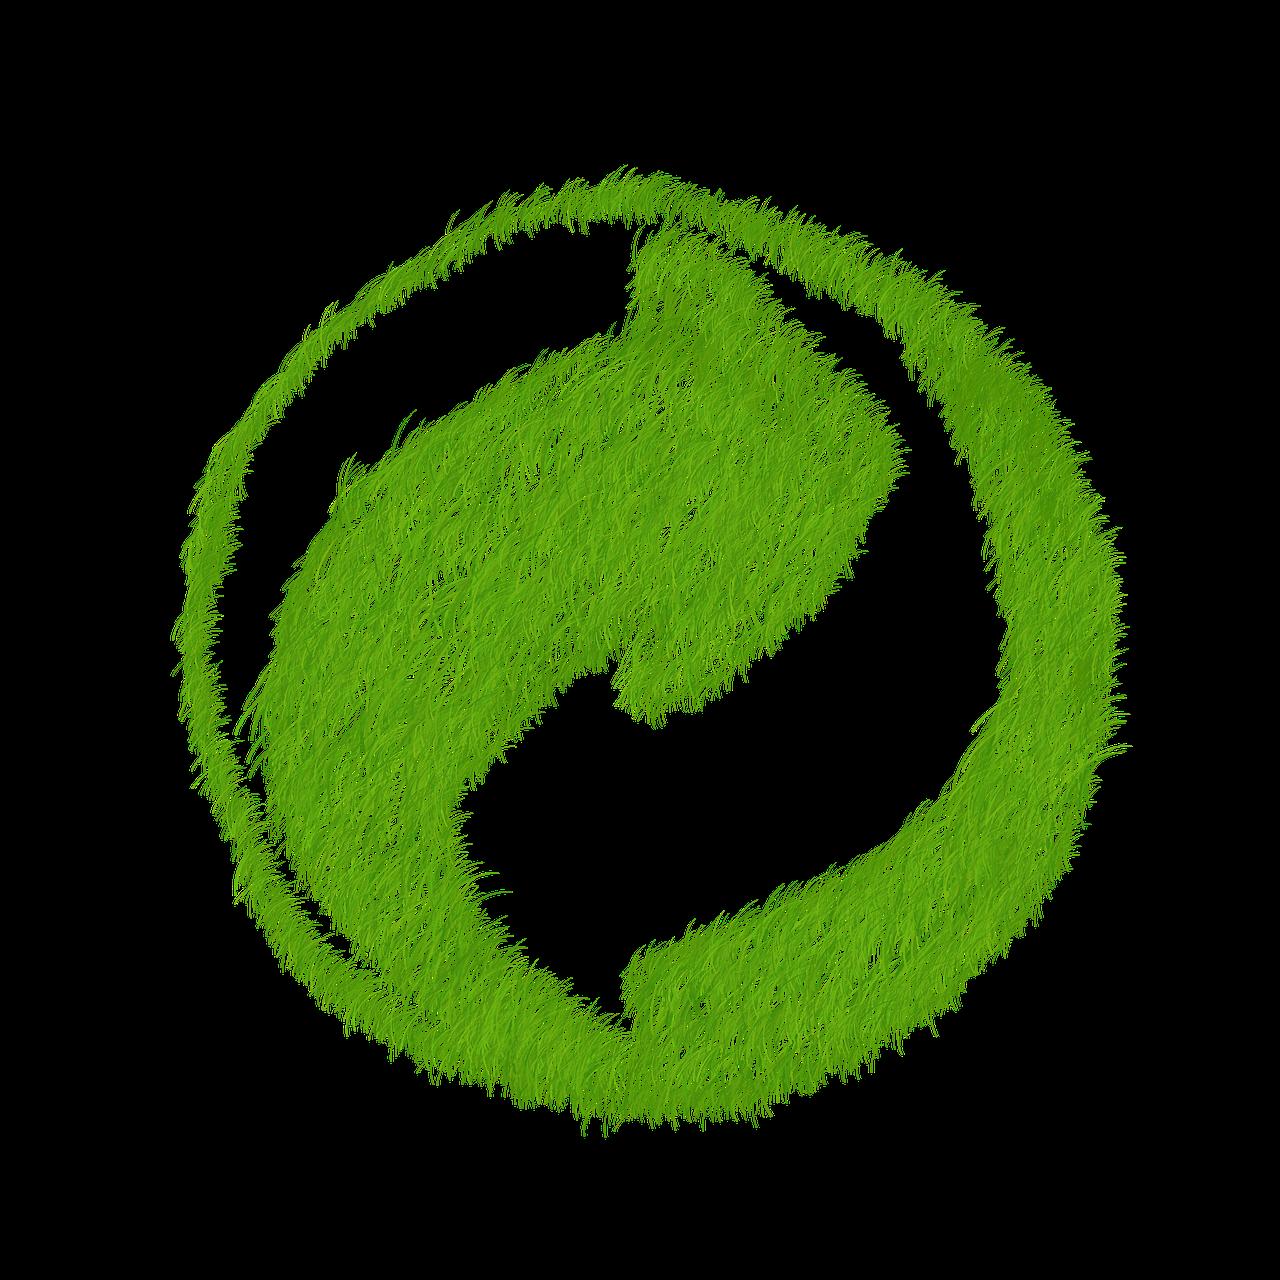 Recycling-Wirtschaft